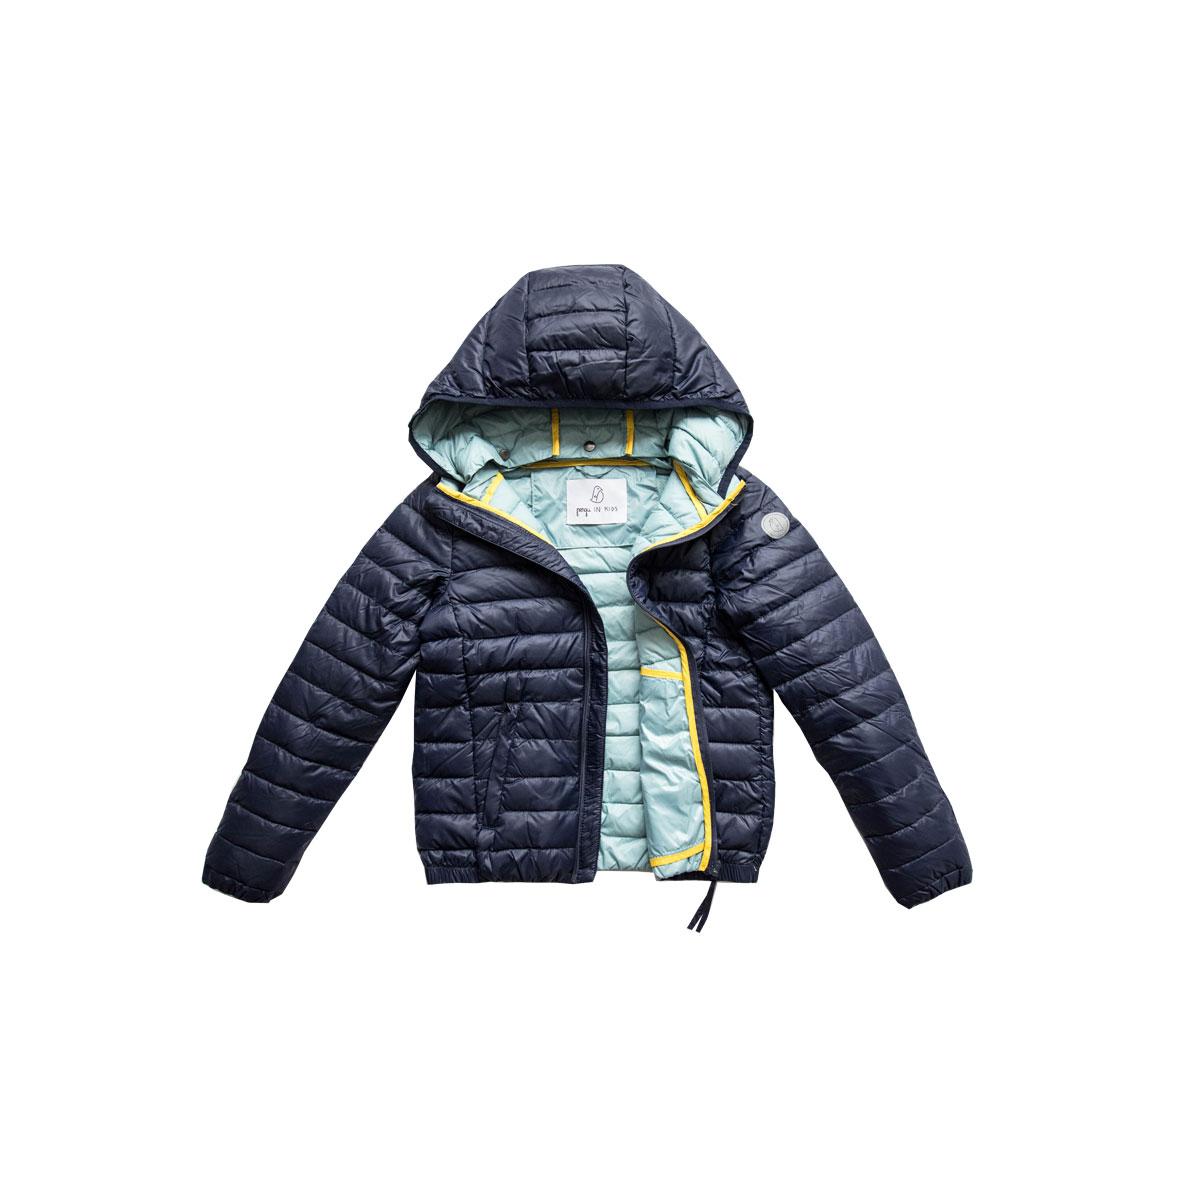 Pengu KIDS ultra light down jacket